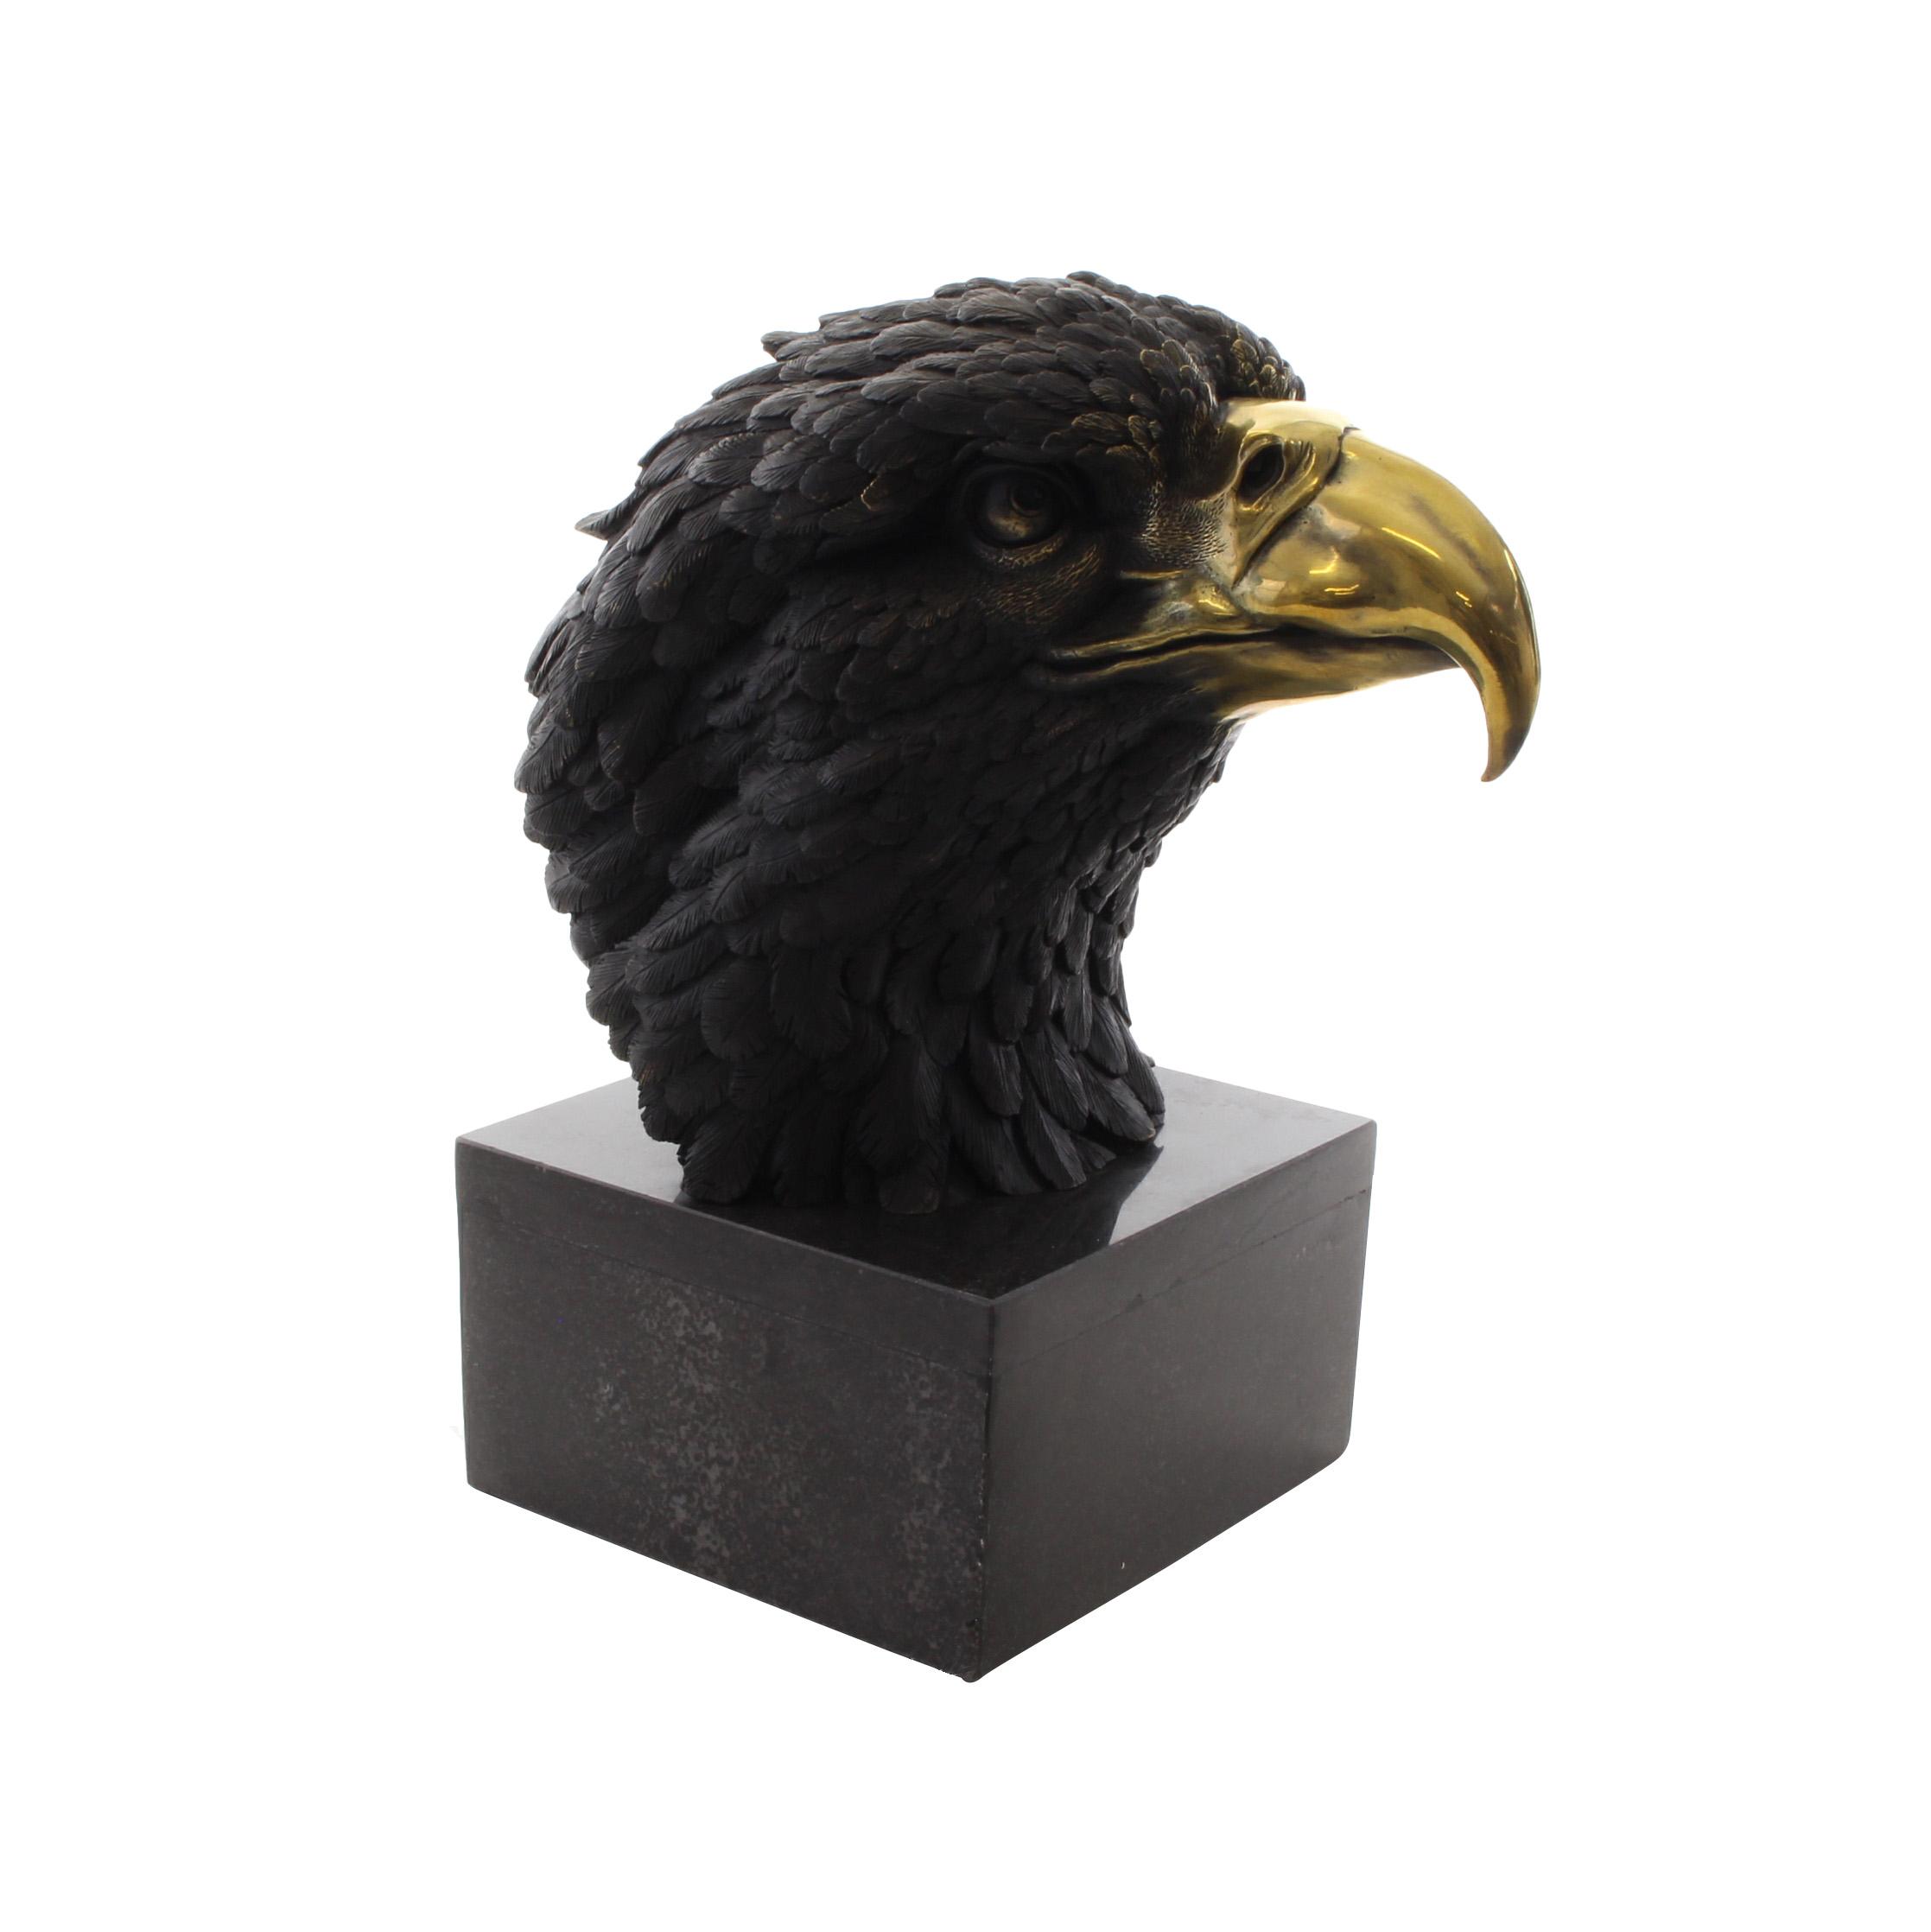 Bronze Antiques Bronzeskulptur Eule Uhu Vogel Bronze Bronzefigur Figur Skulptur 27cm